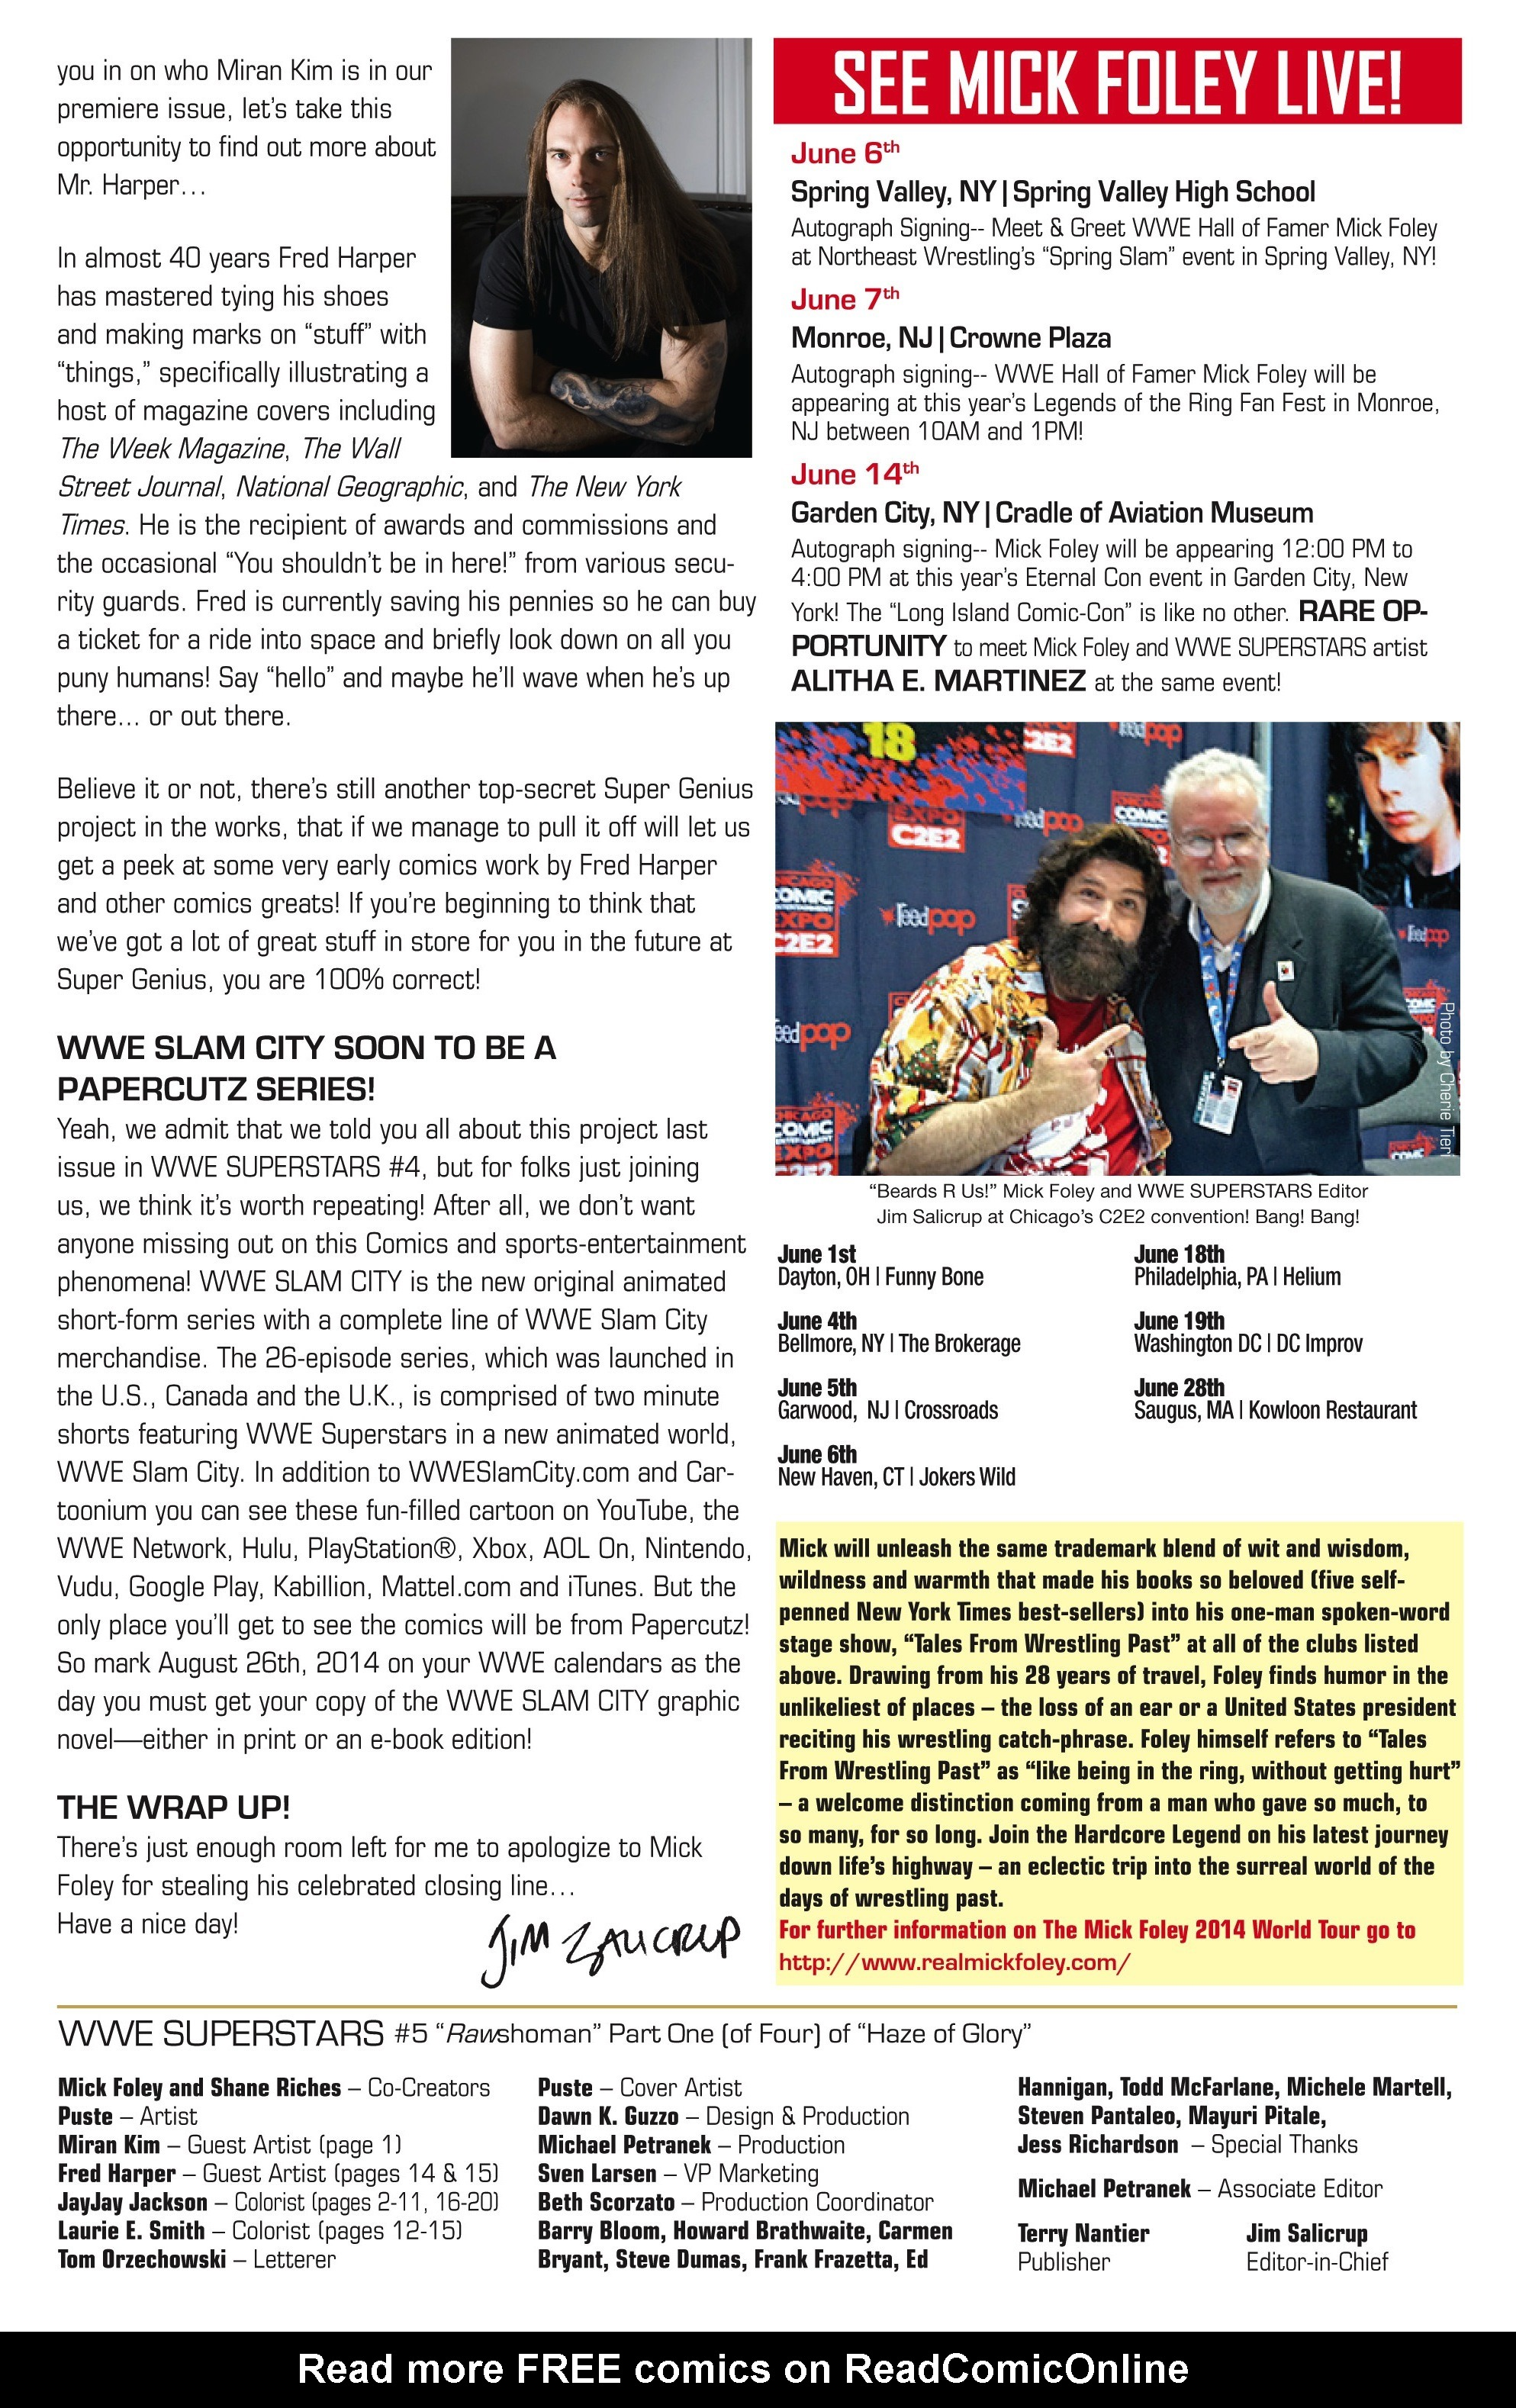 Read online WWE Superstars comic -  Issue #5 - 27